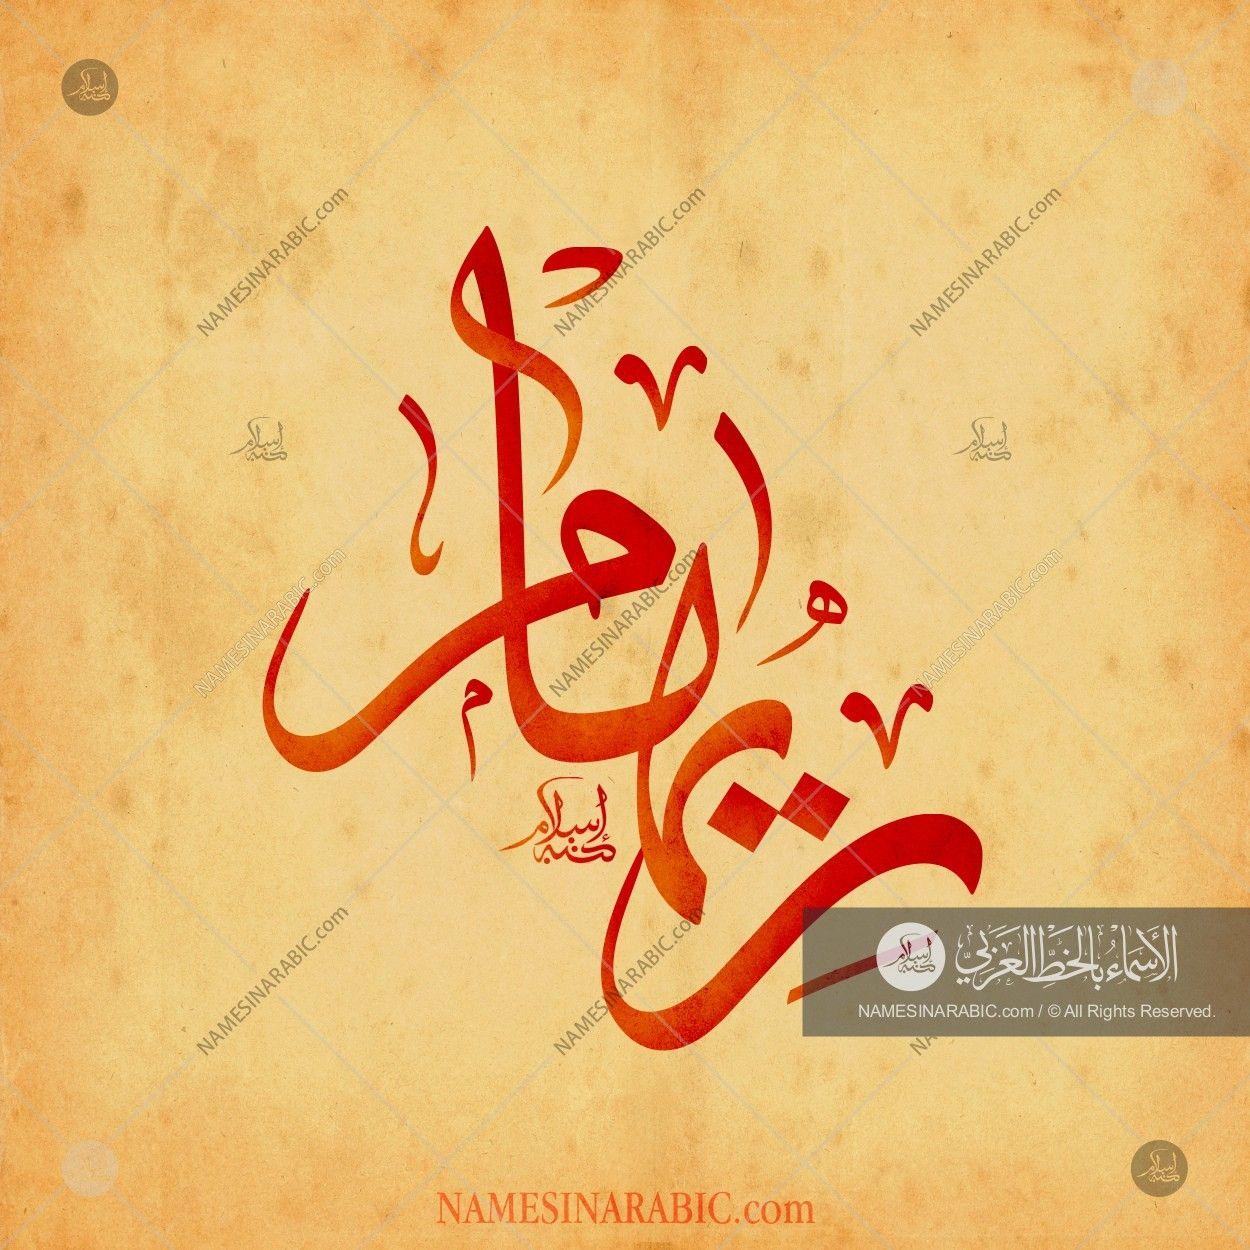 Riham ريهام Names In Arabic Calligraphy Name 4523 Calligraphy Name Calligraphy Arabic Calligraphy